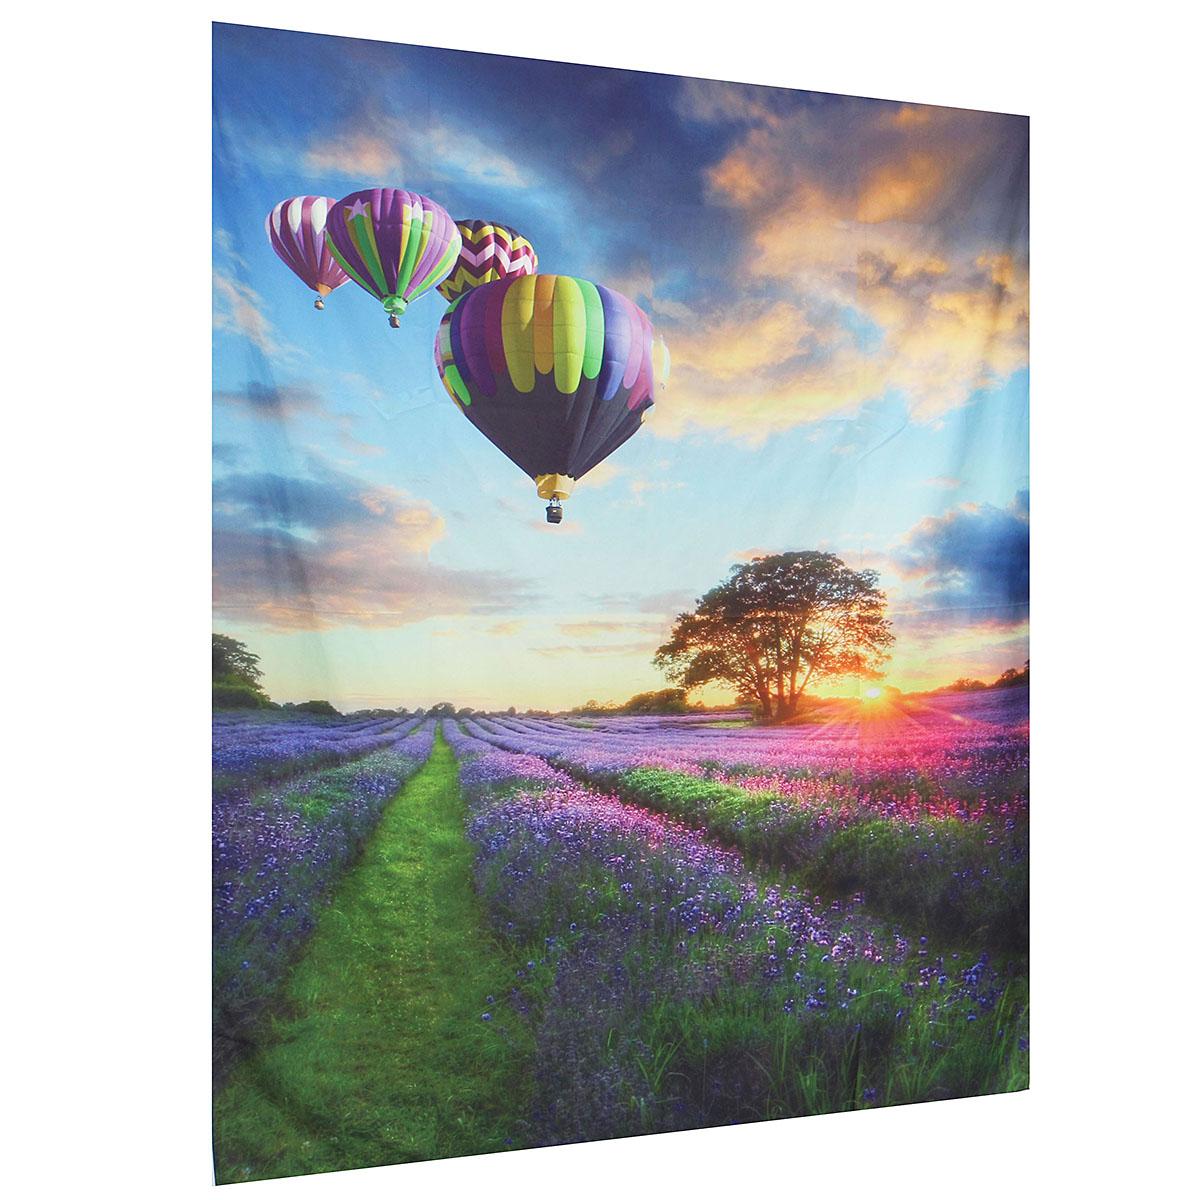 IPRee™ 150x130CM Outdoor Travel Beach Towel Mat Hot Air Balloon Lavender Bohemian Cotton Tapestry